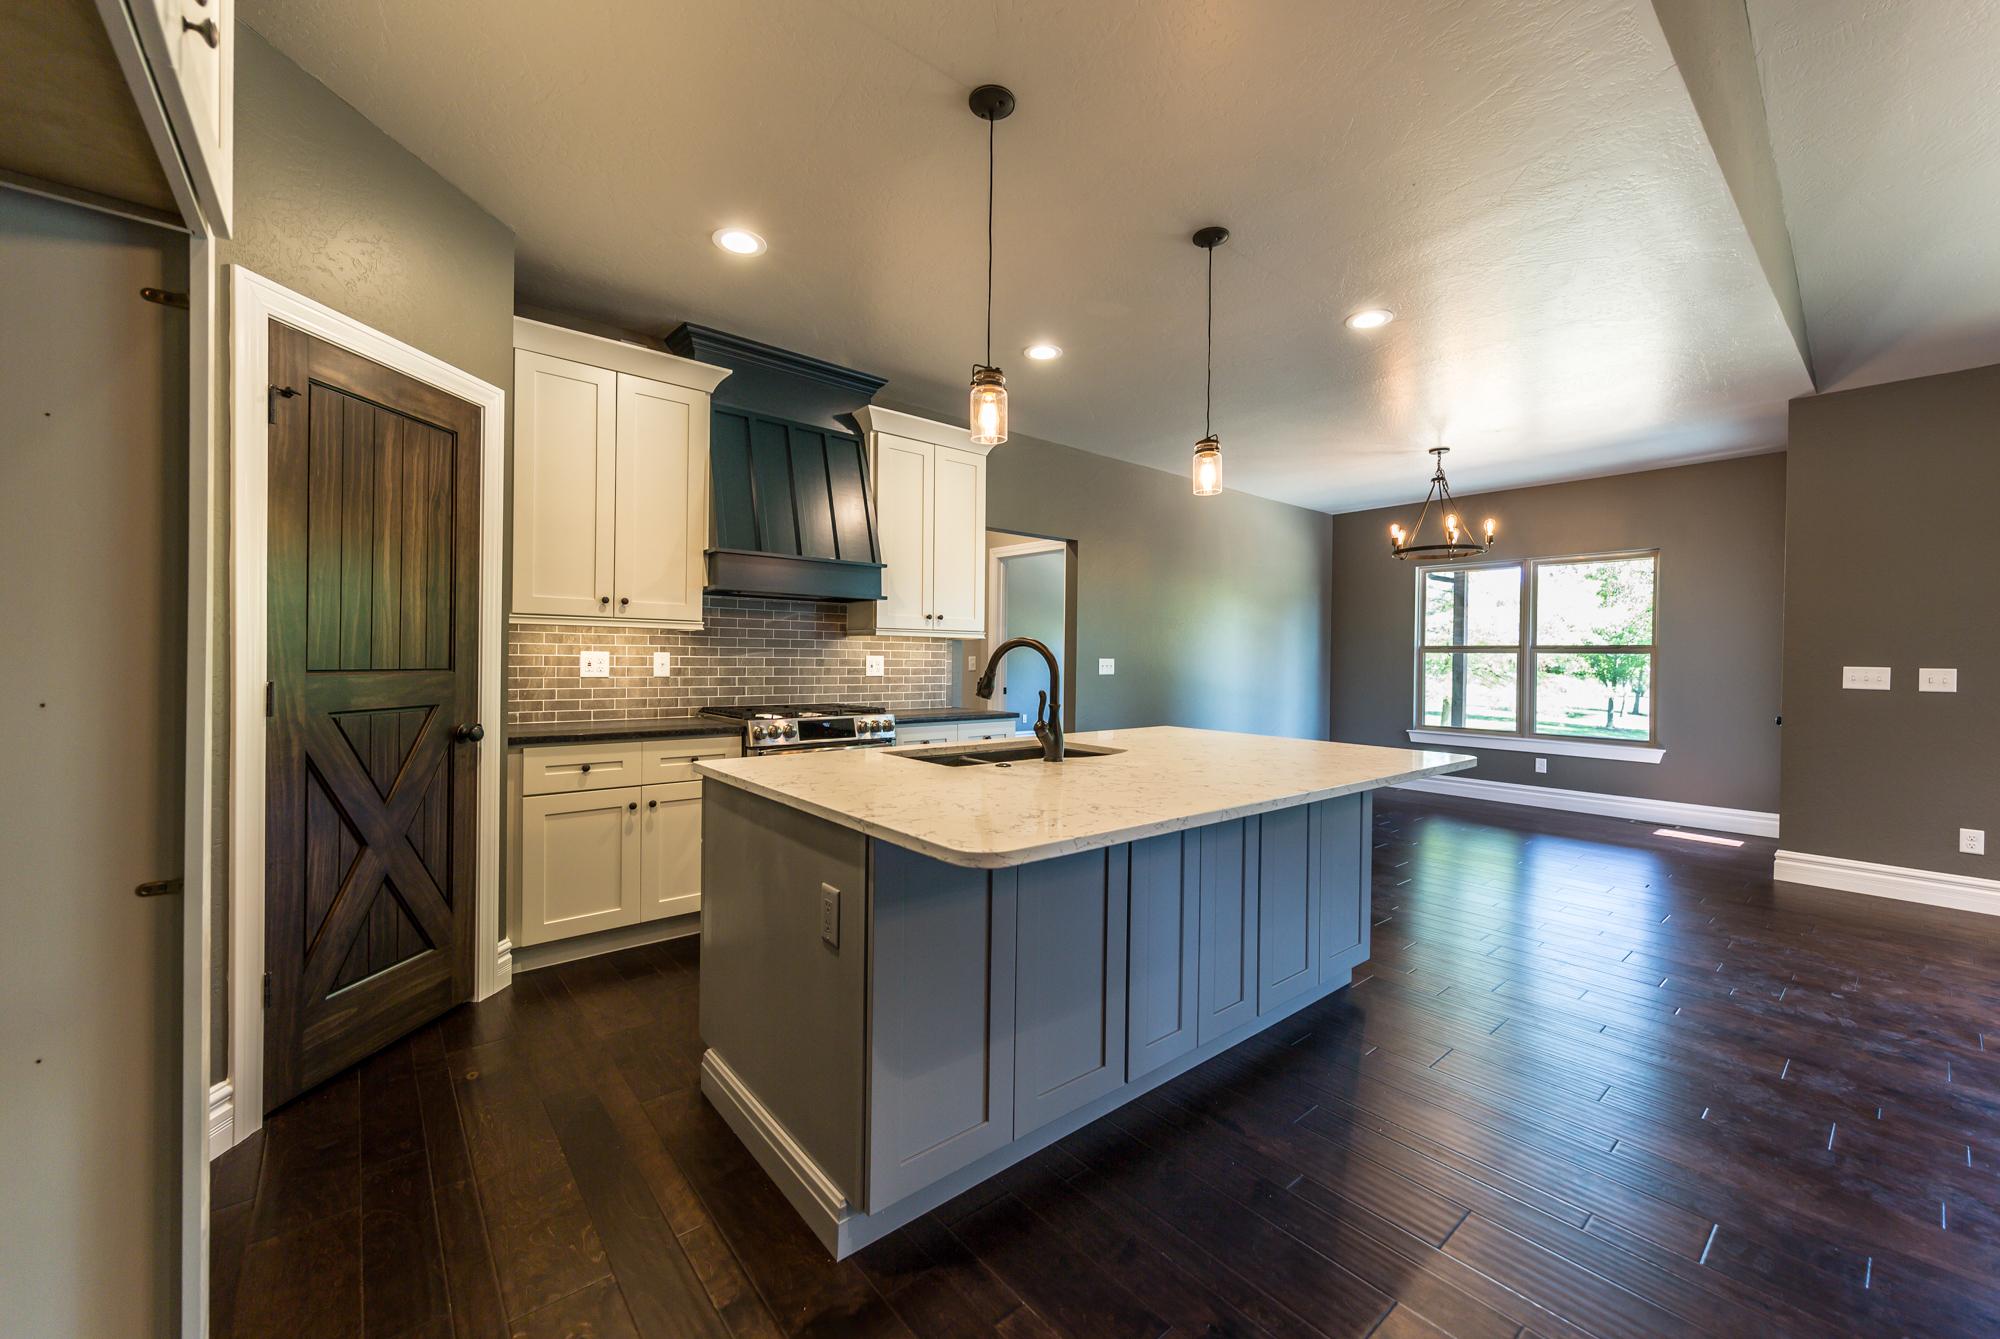 Home_For_Sale_O'Fallon_Illinois_Scott_AFB_CR_Holland-10.jpg